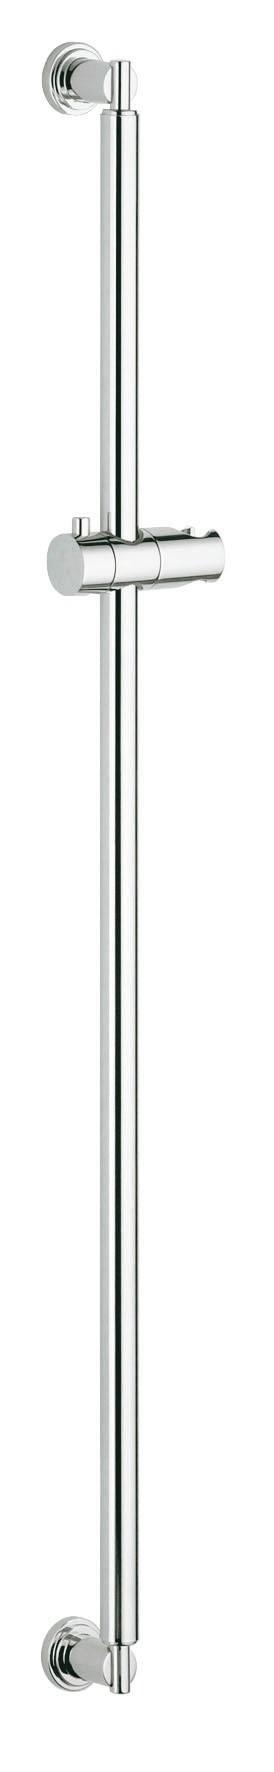 Душевой кронштейн Grohe Sena 900 мм, хром 28346000